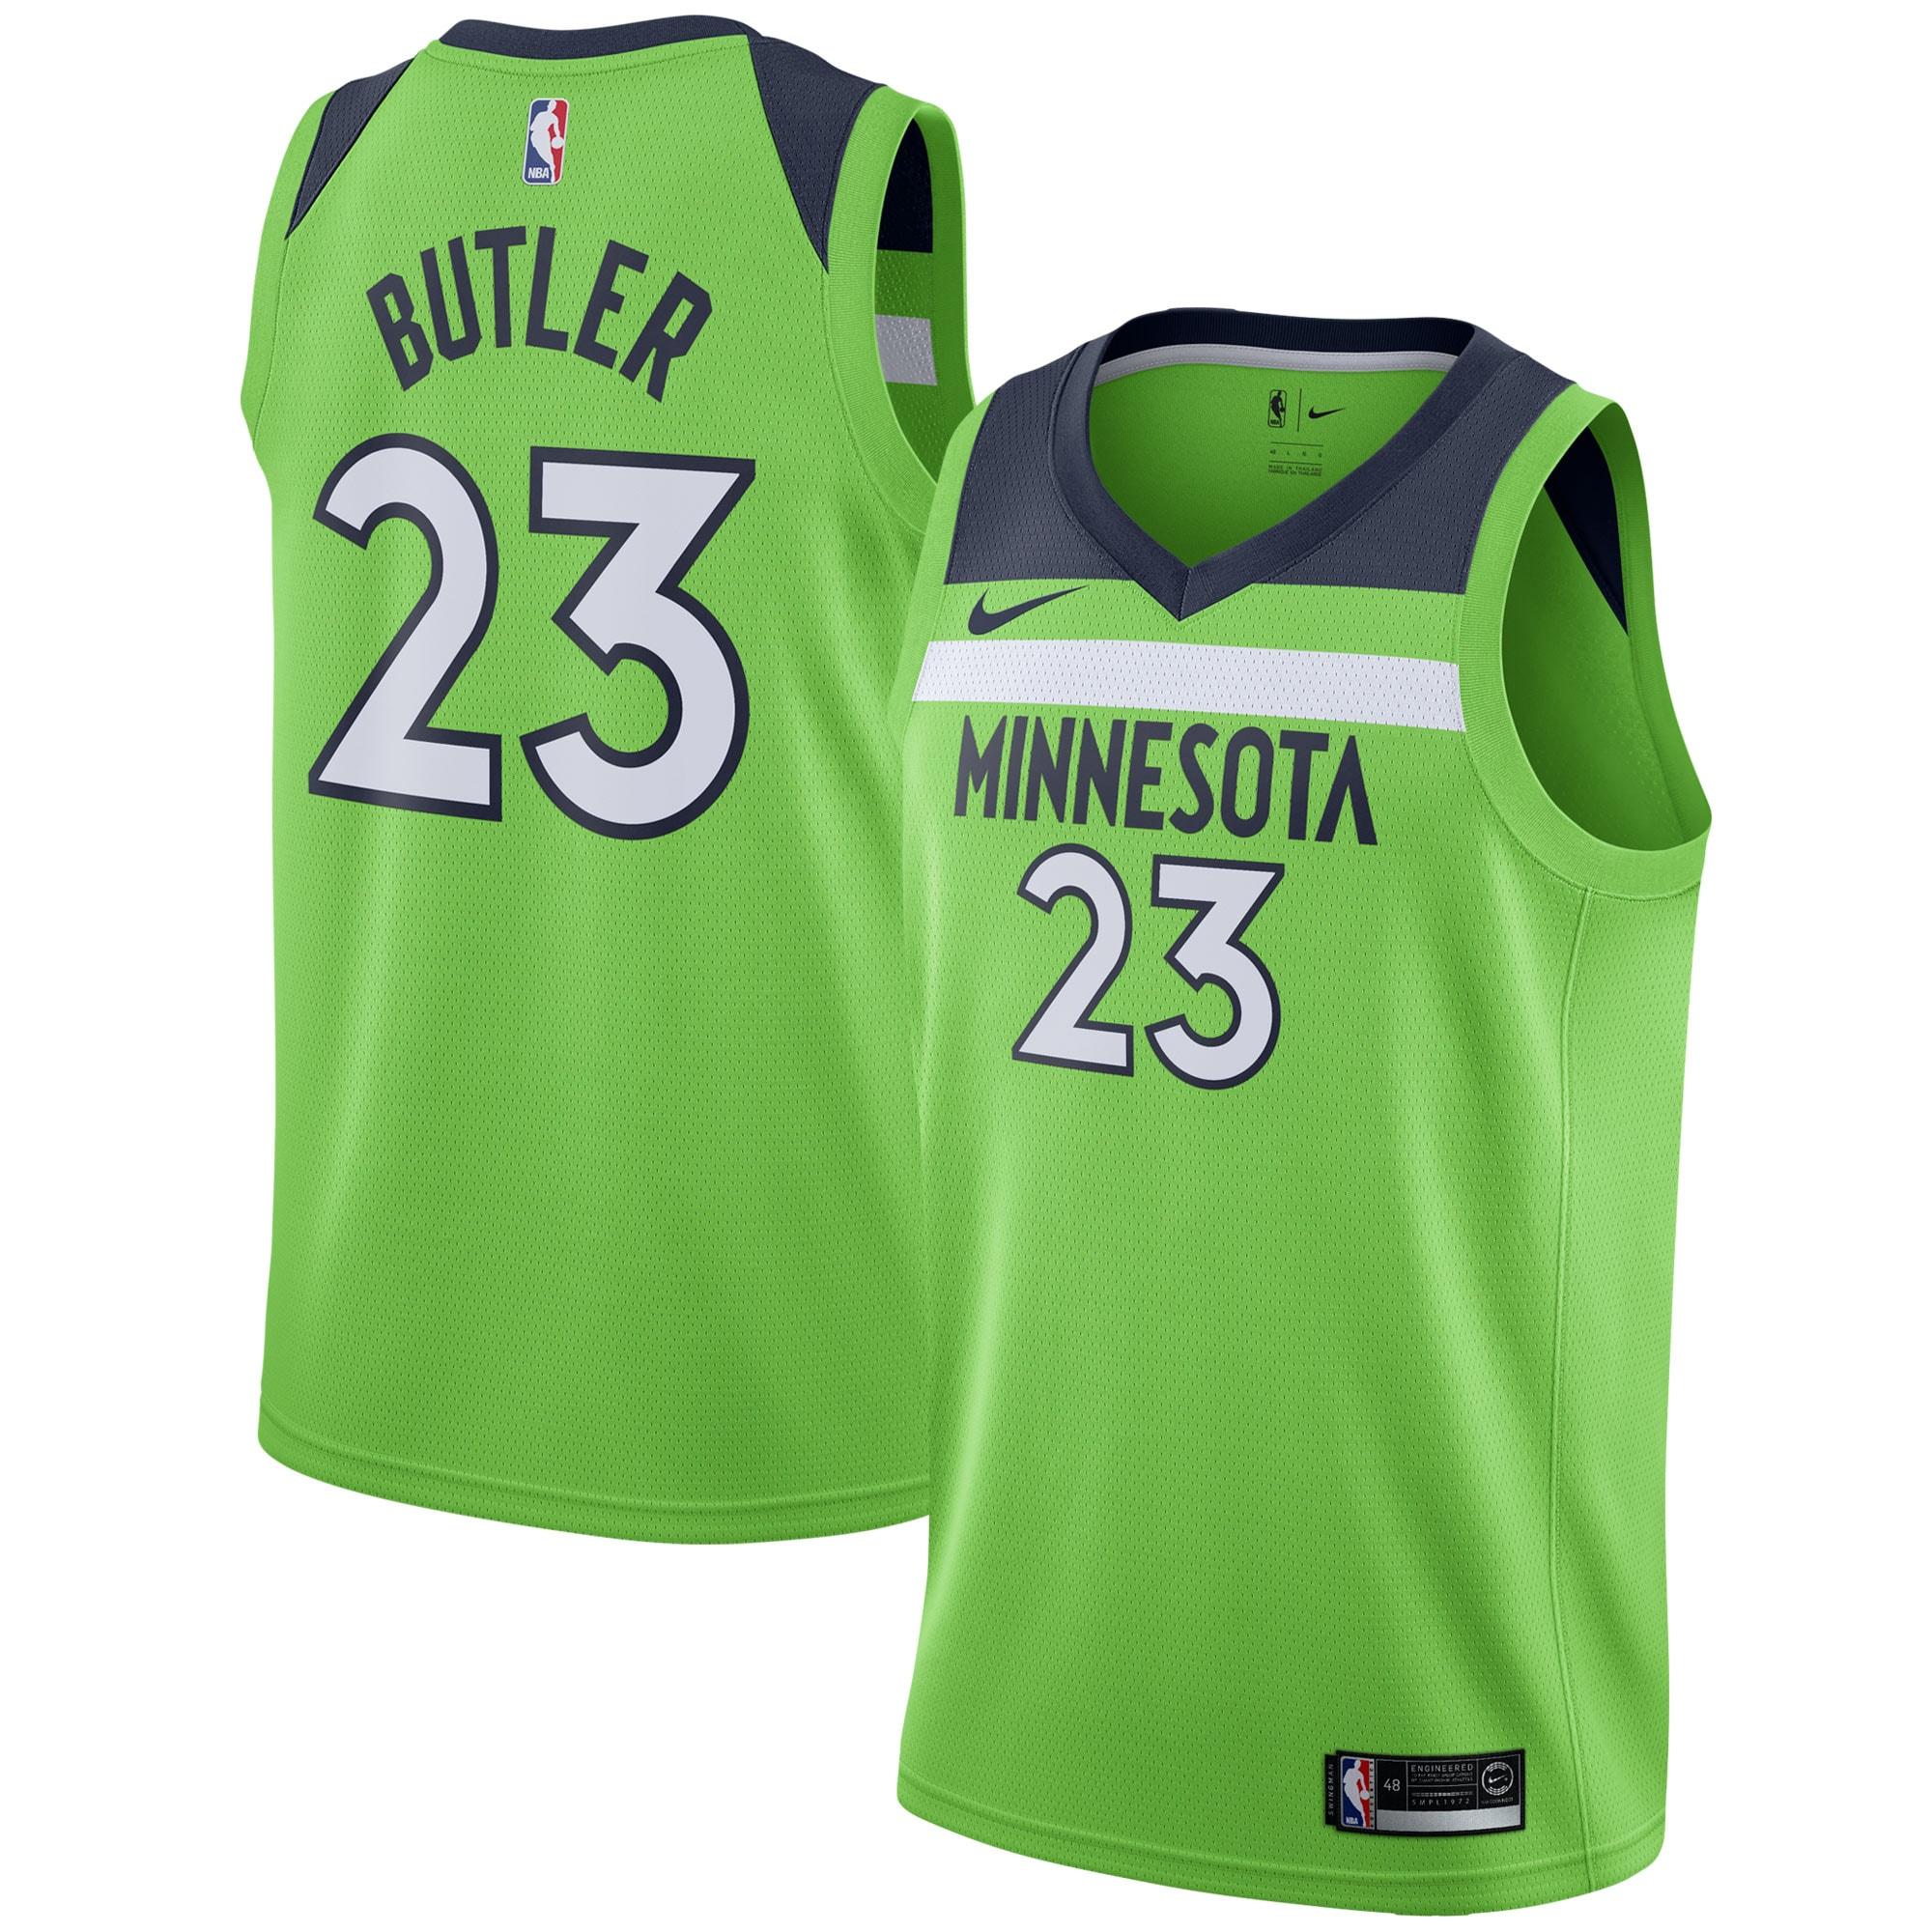 Jimmy Butler Minnesota Timberwolves Nike Swingman Jersey - Statement Edition - Green